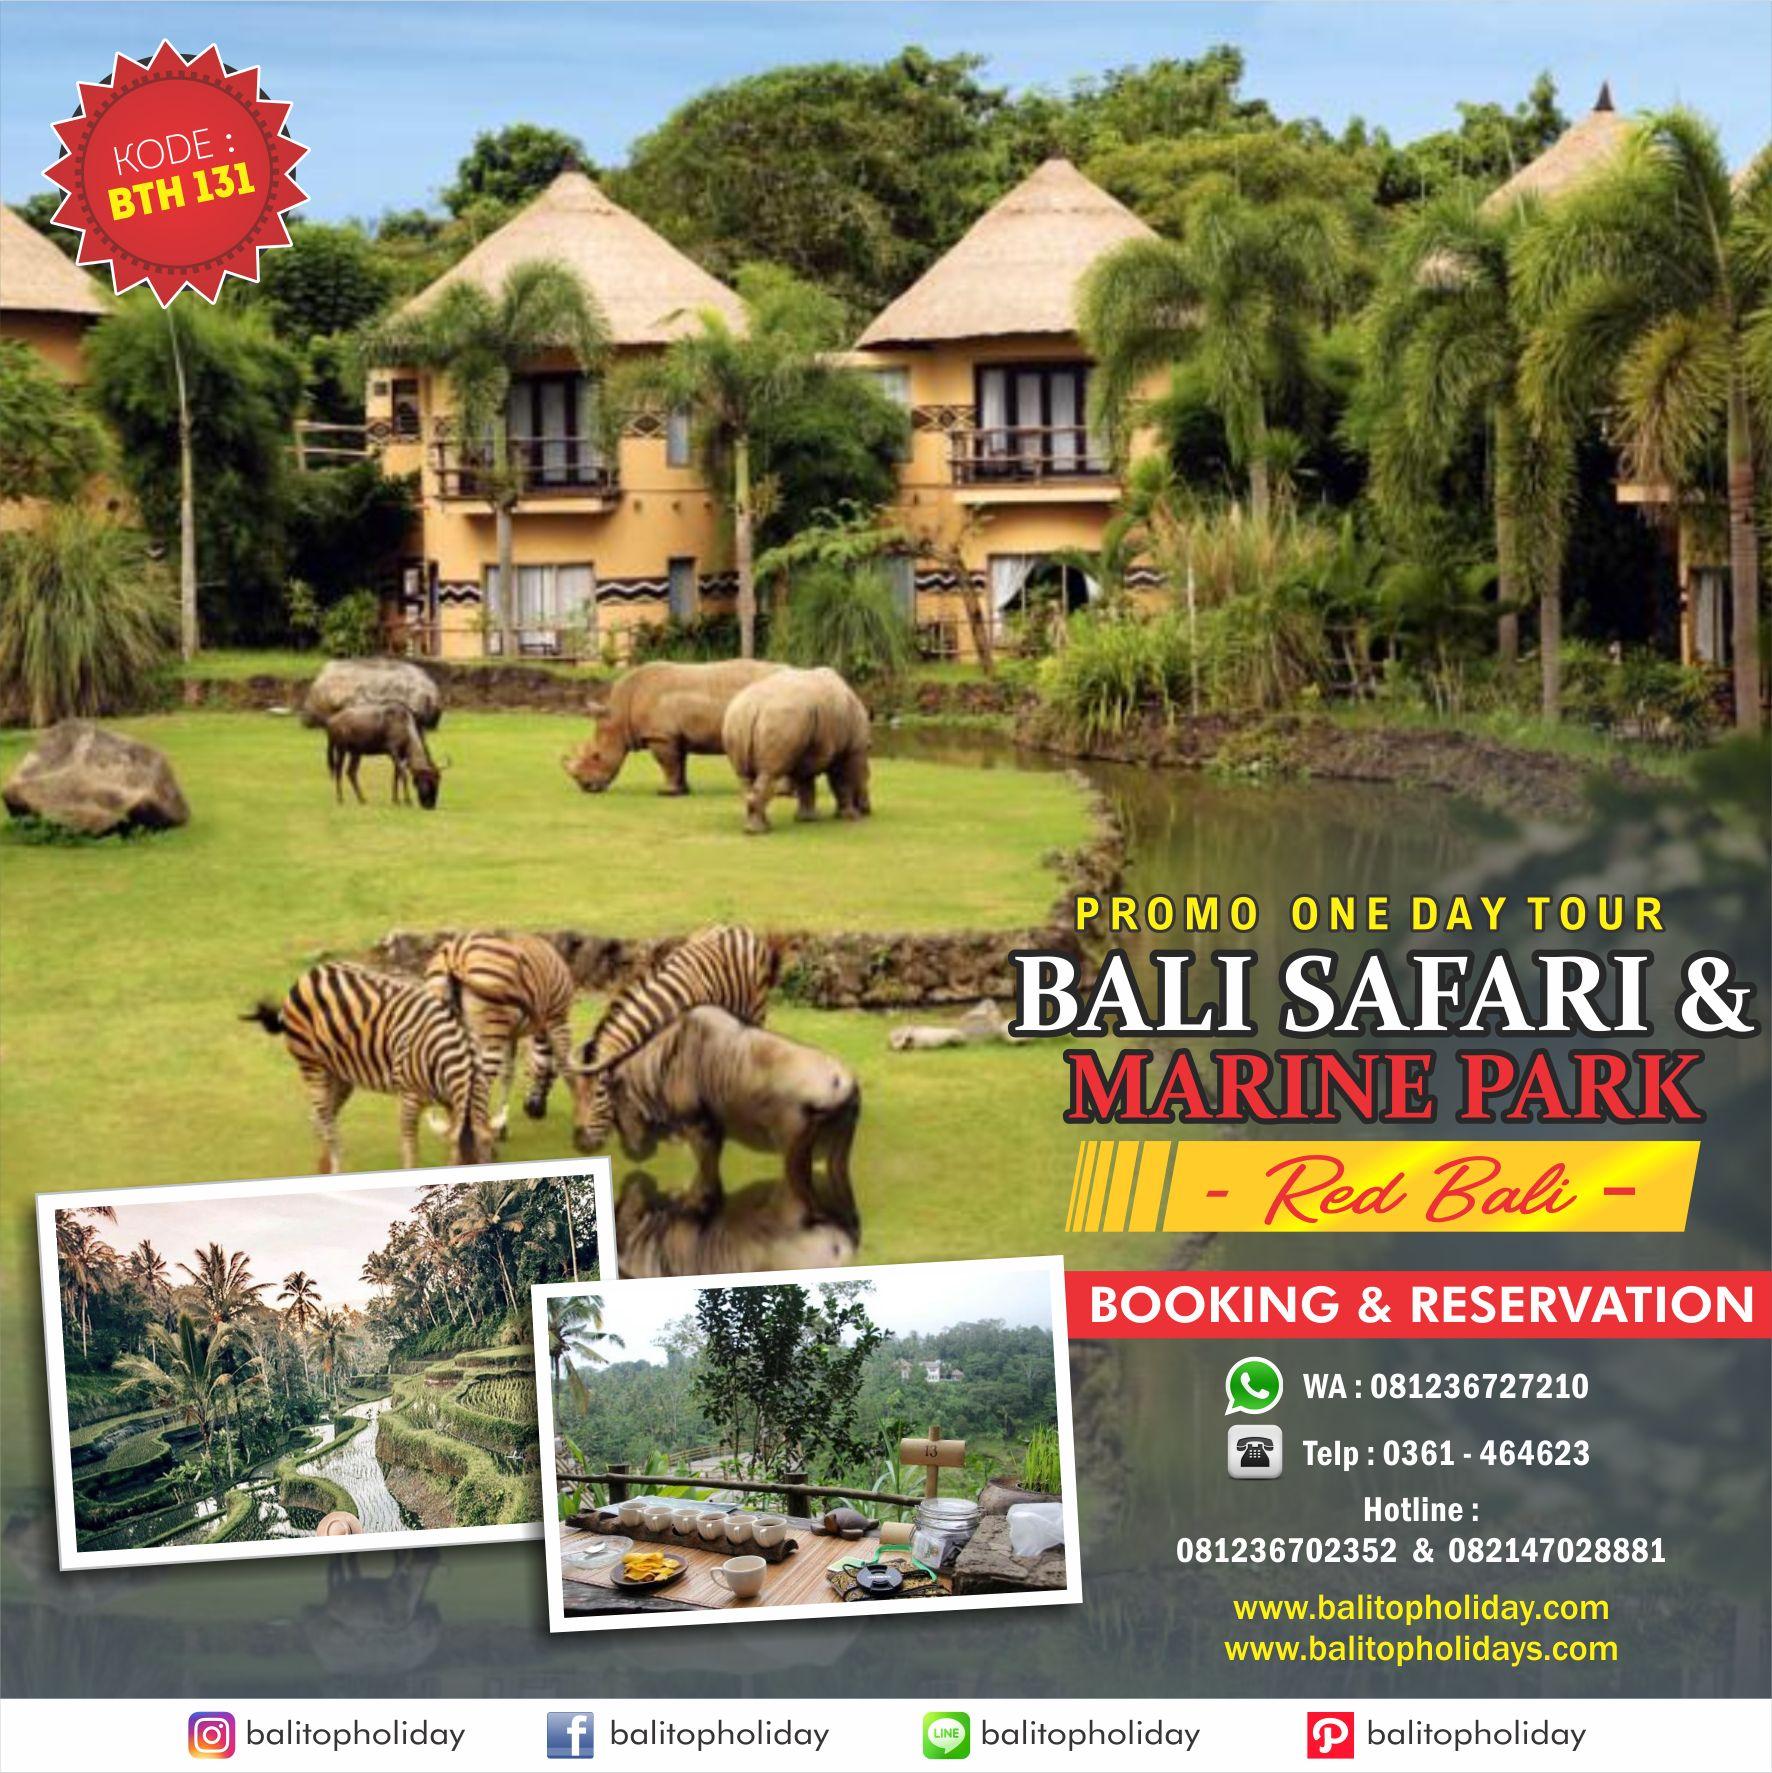 Paket Tour Bali Safari and Marine Park